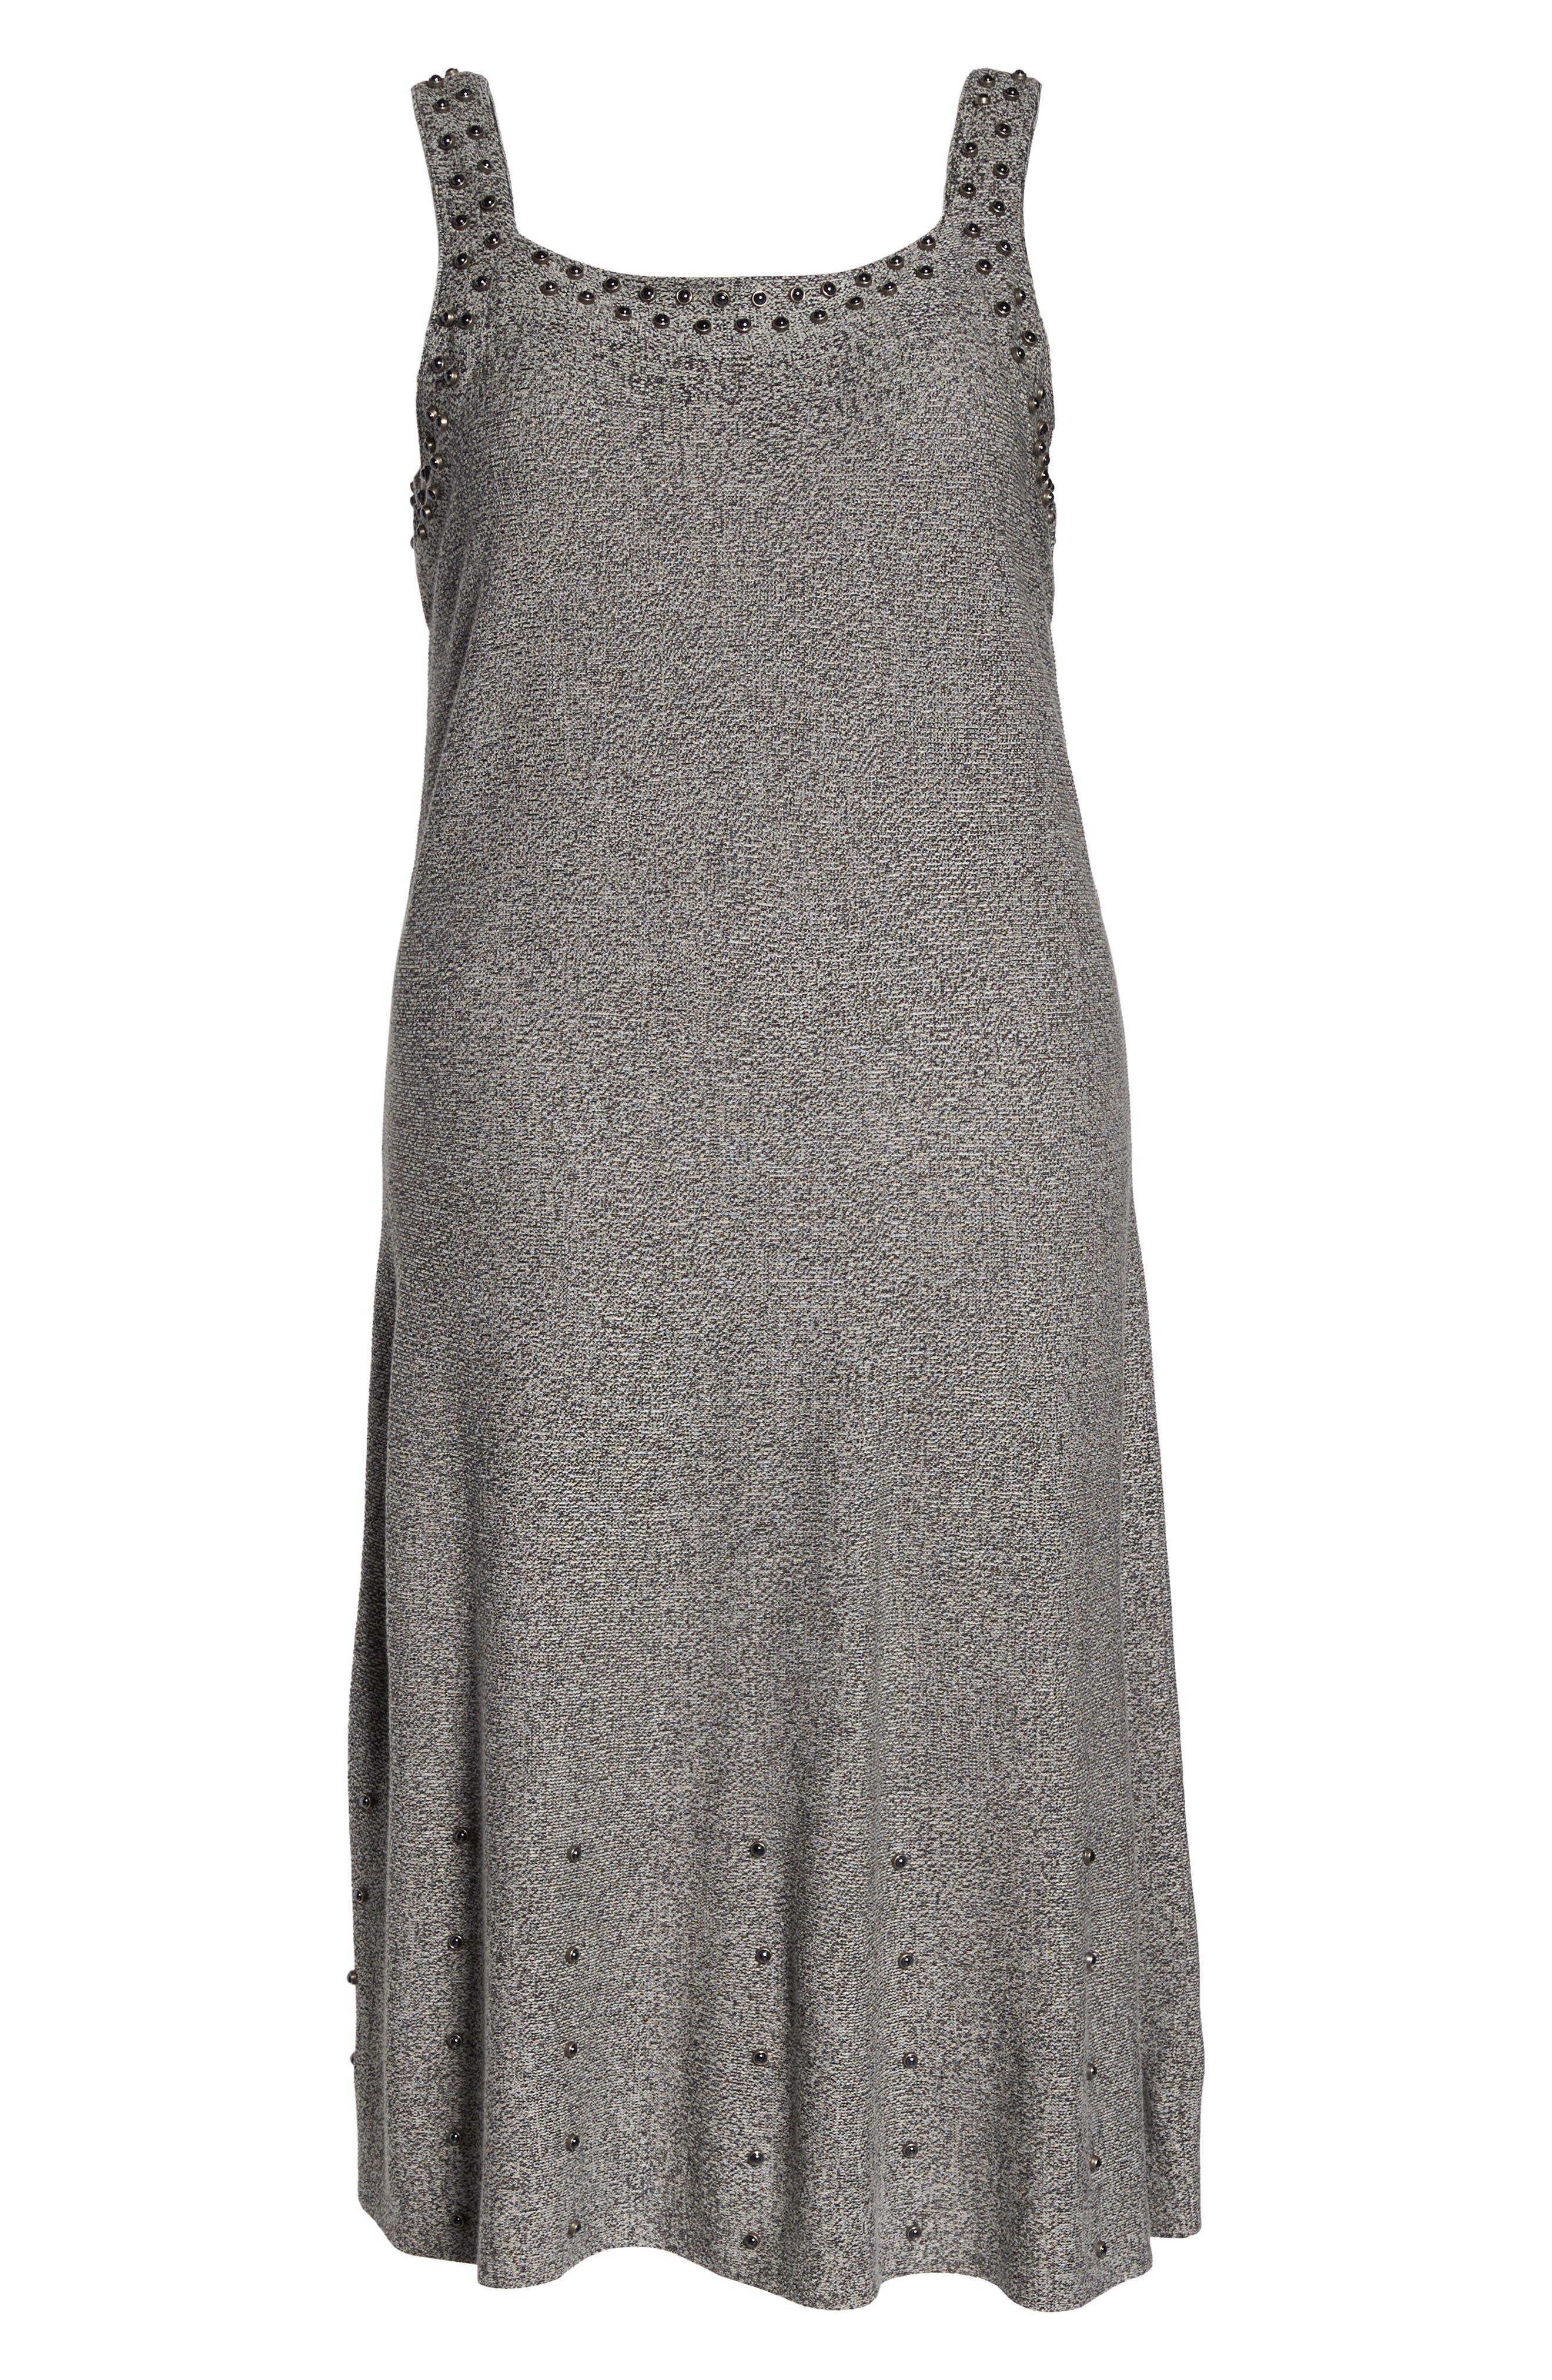 Modern Stud A-Line Dress,                             Alternate thumbnail 6, color,                             062